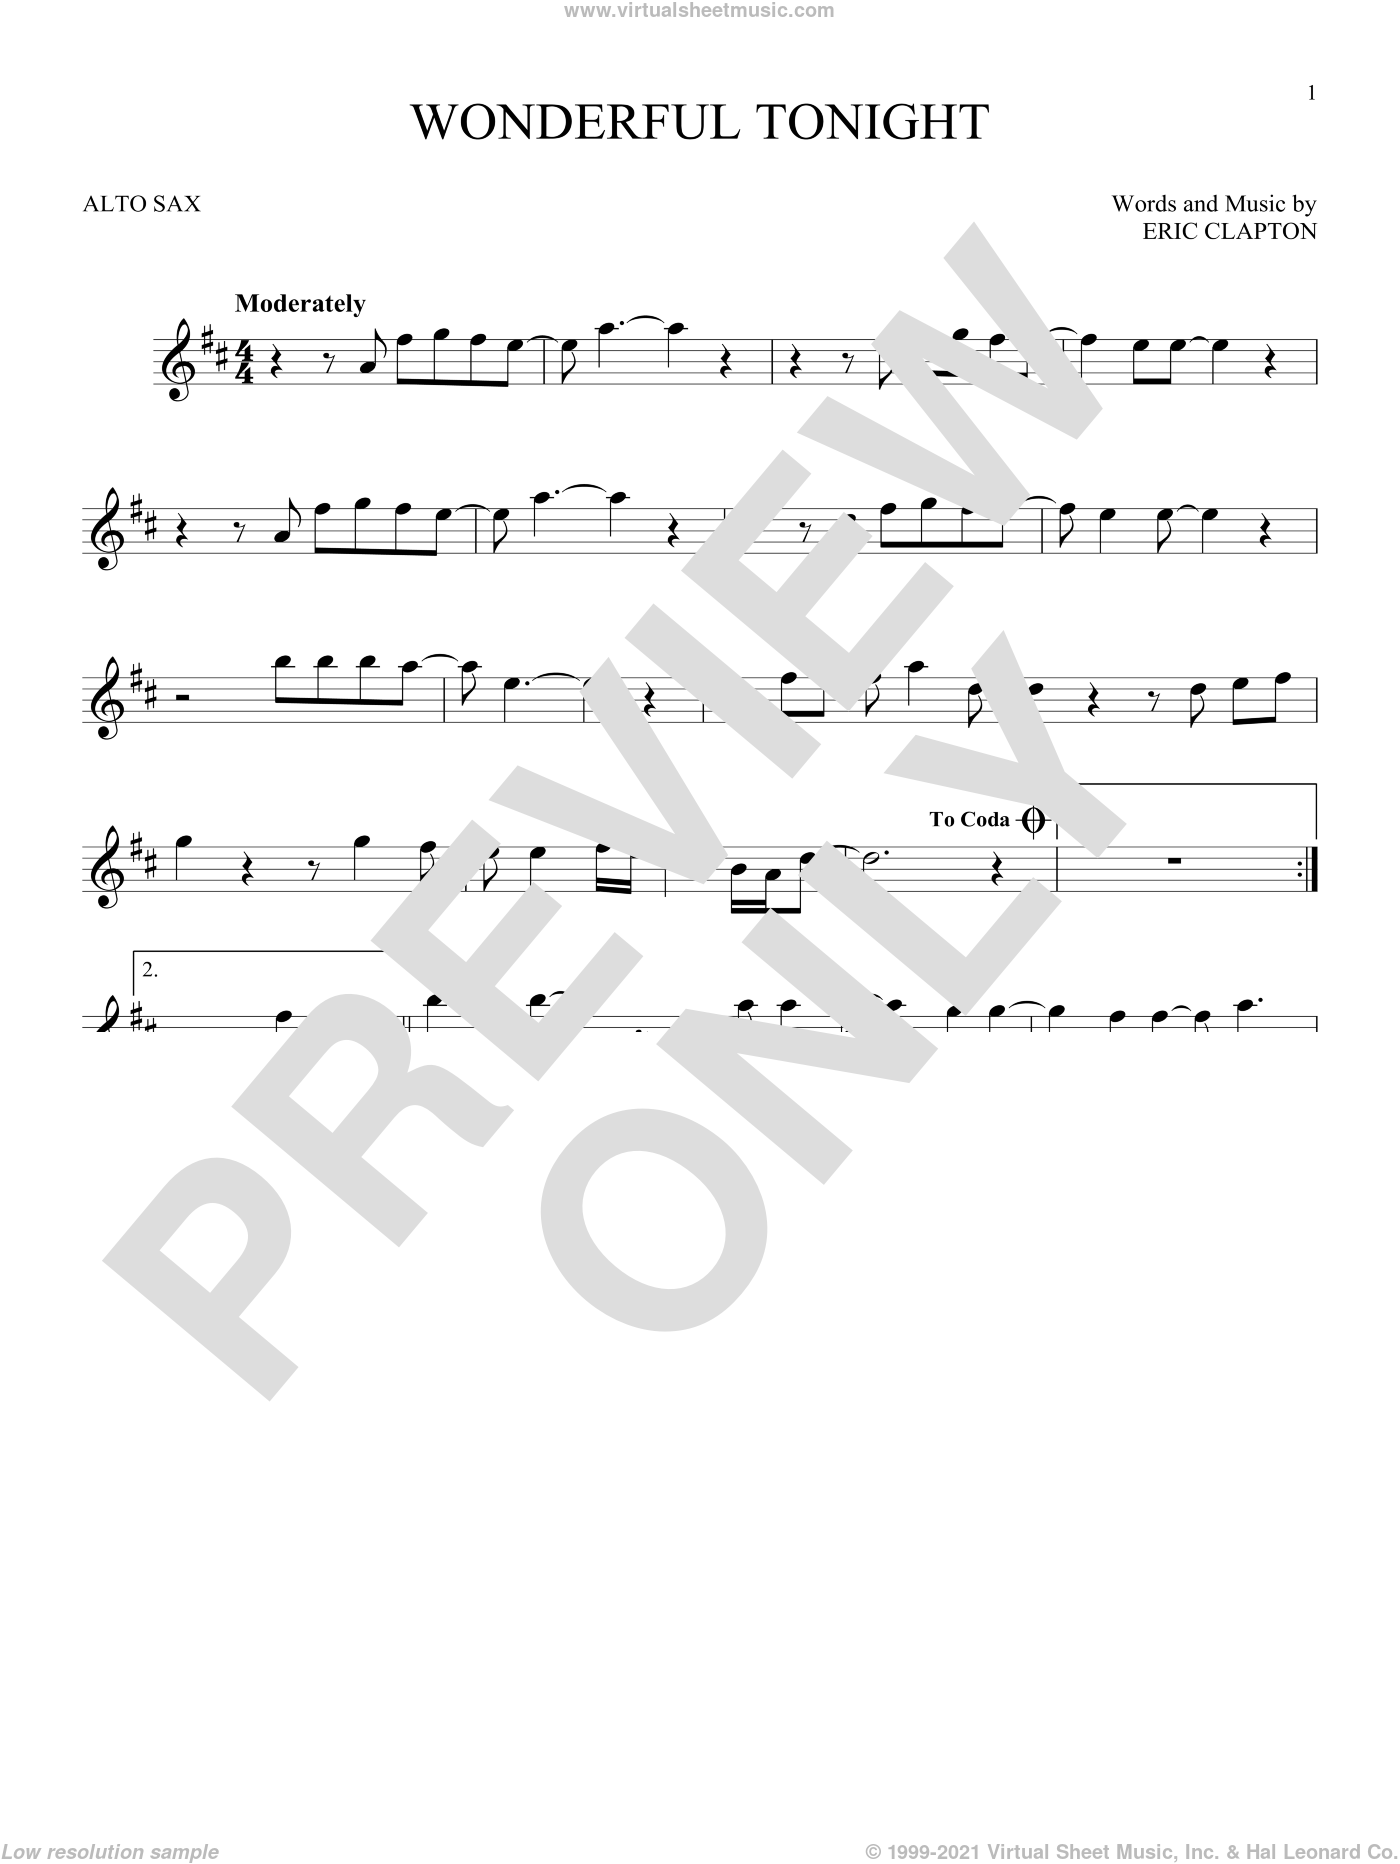 Wonderful Tonight sheet music for alto saxophone solo by Eric Clapton and David Kersh, wedding score, intermediate skill level